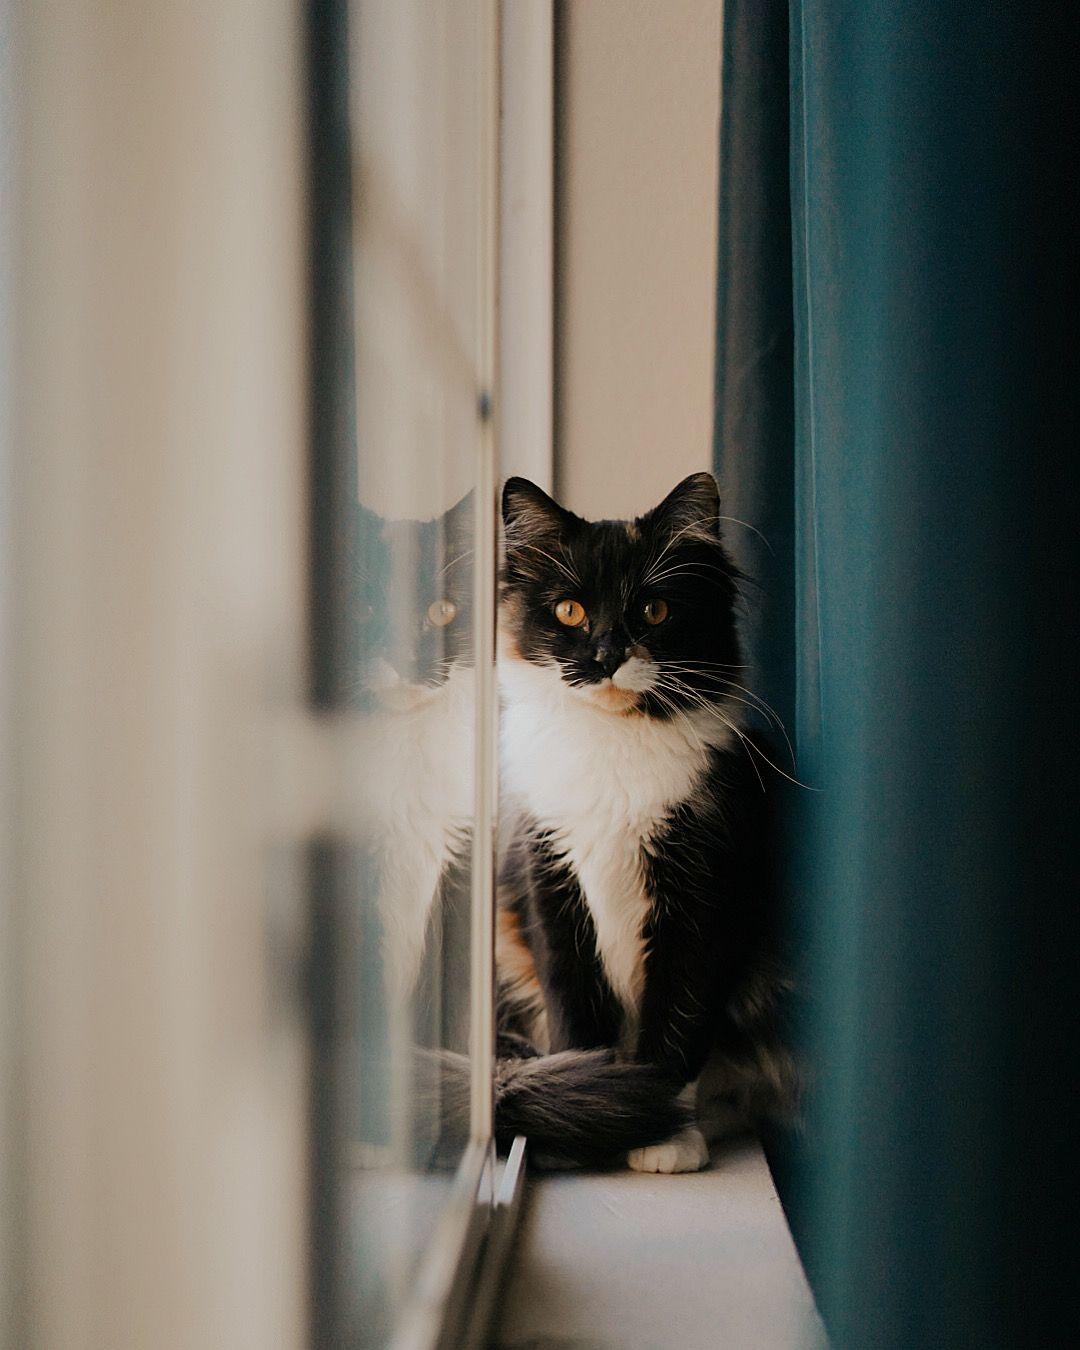 Cat / Kitty / Sushi / Meow / Window